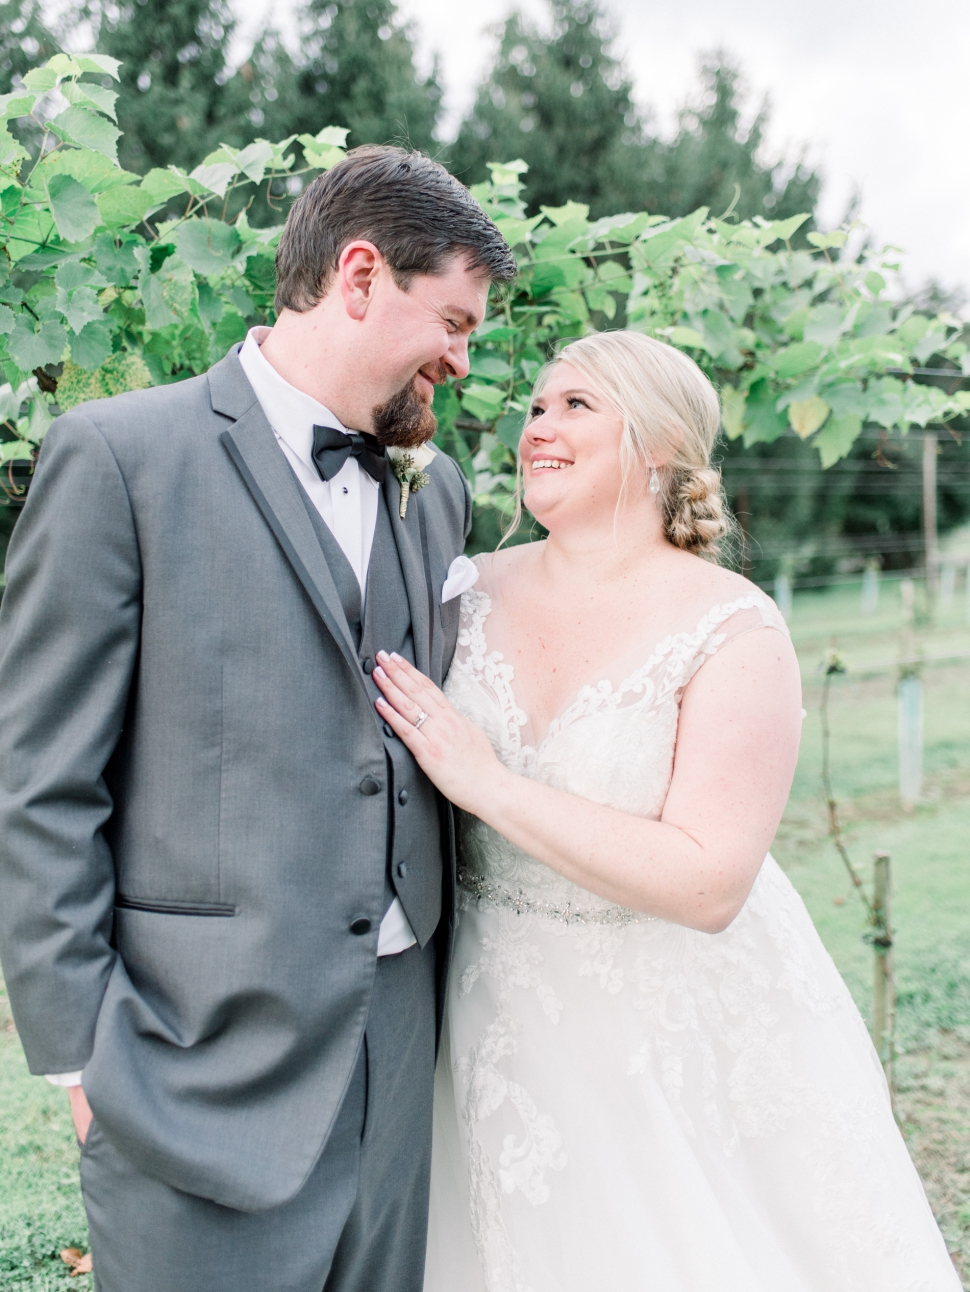 Pennsylvania-Wedding-Photographer-Cassi-Claire-Rosebank-Winery-Wedding_13.jpg